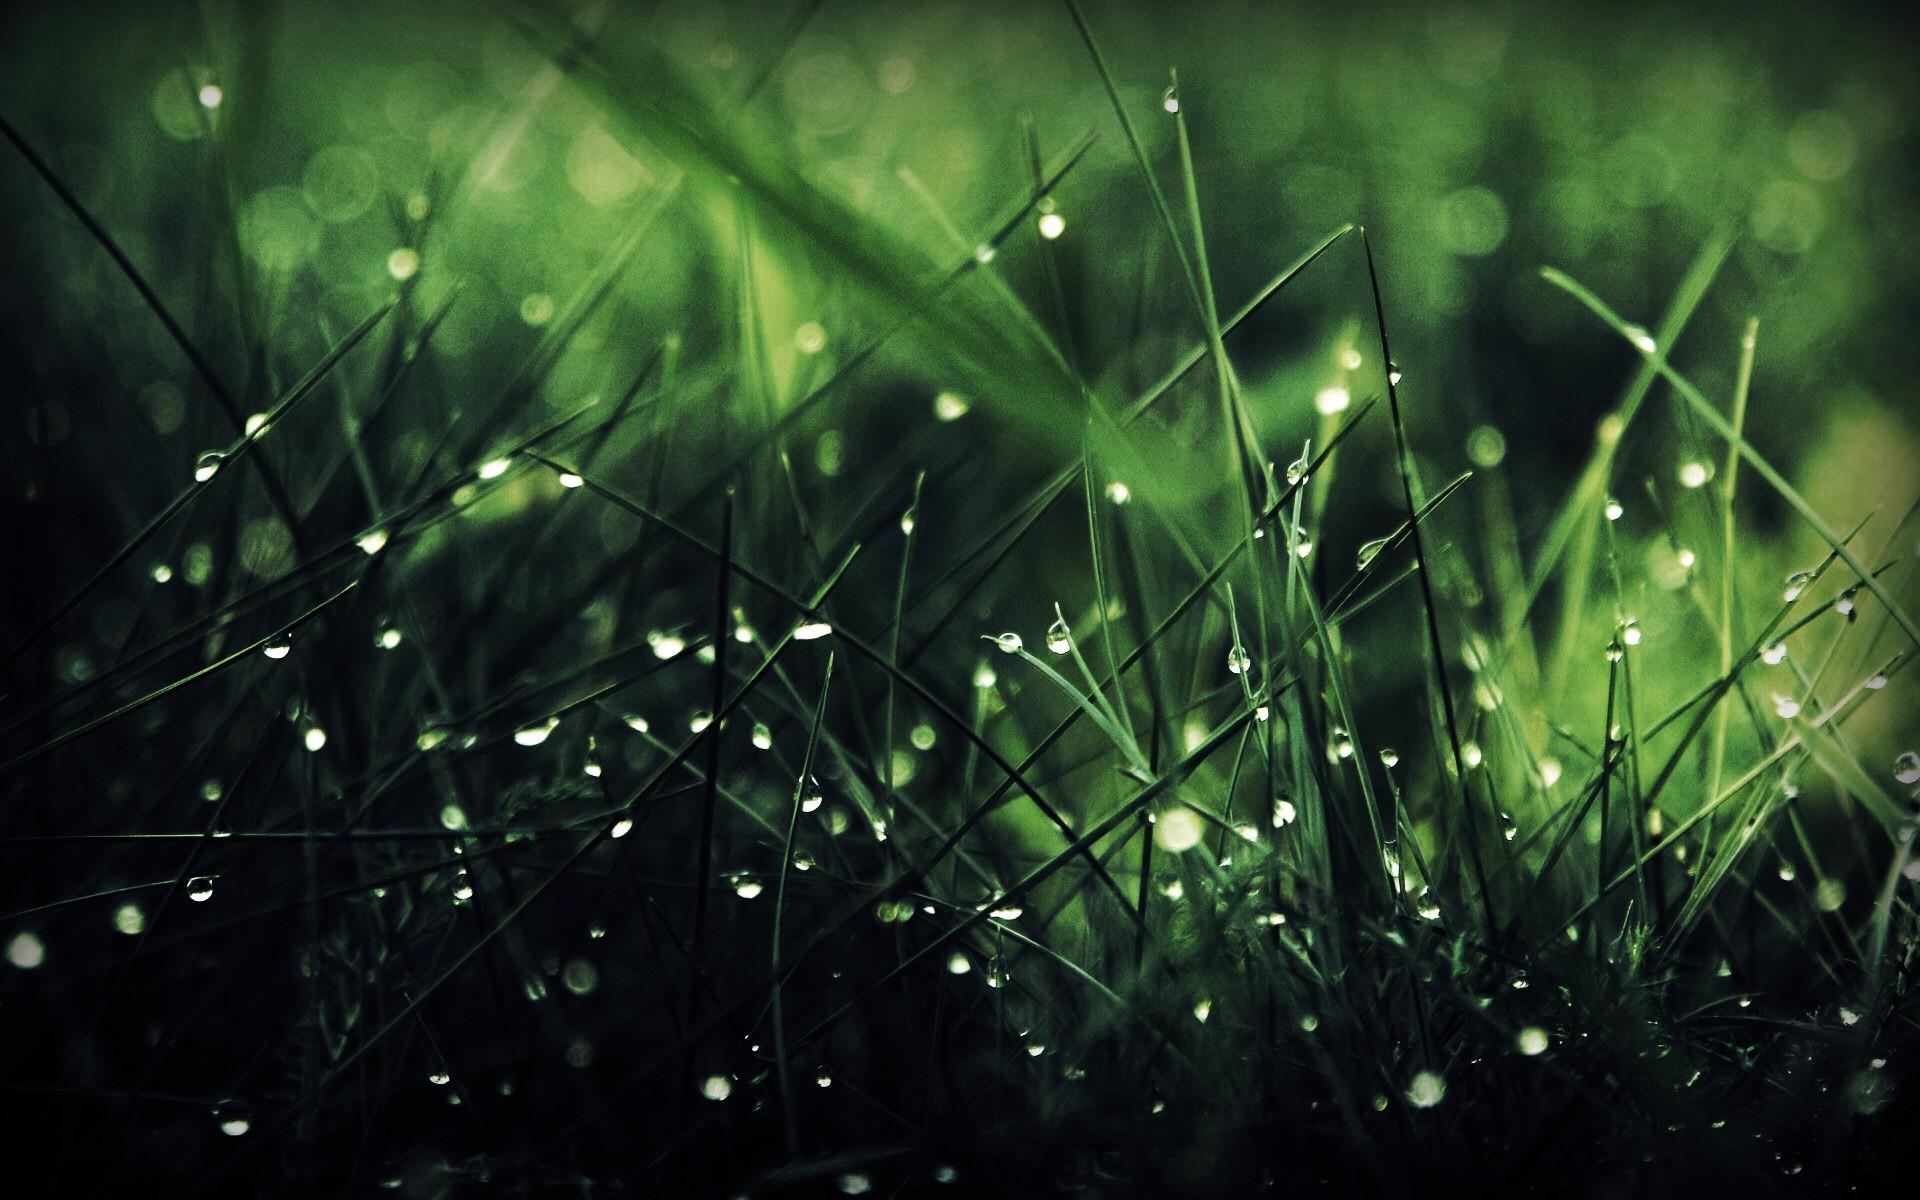 General 1920x1200 grass water drops nature macro